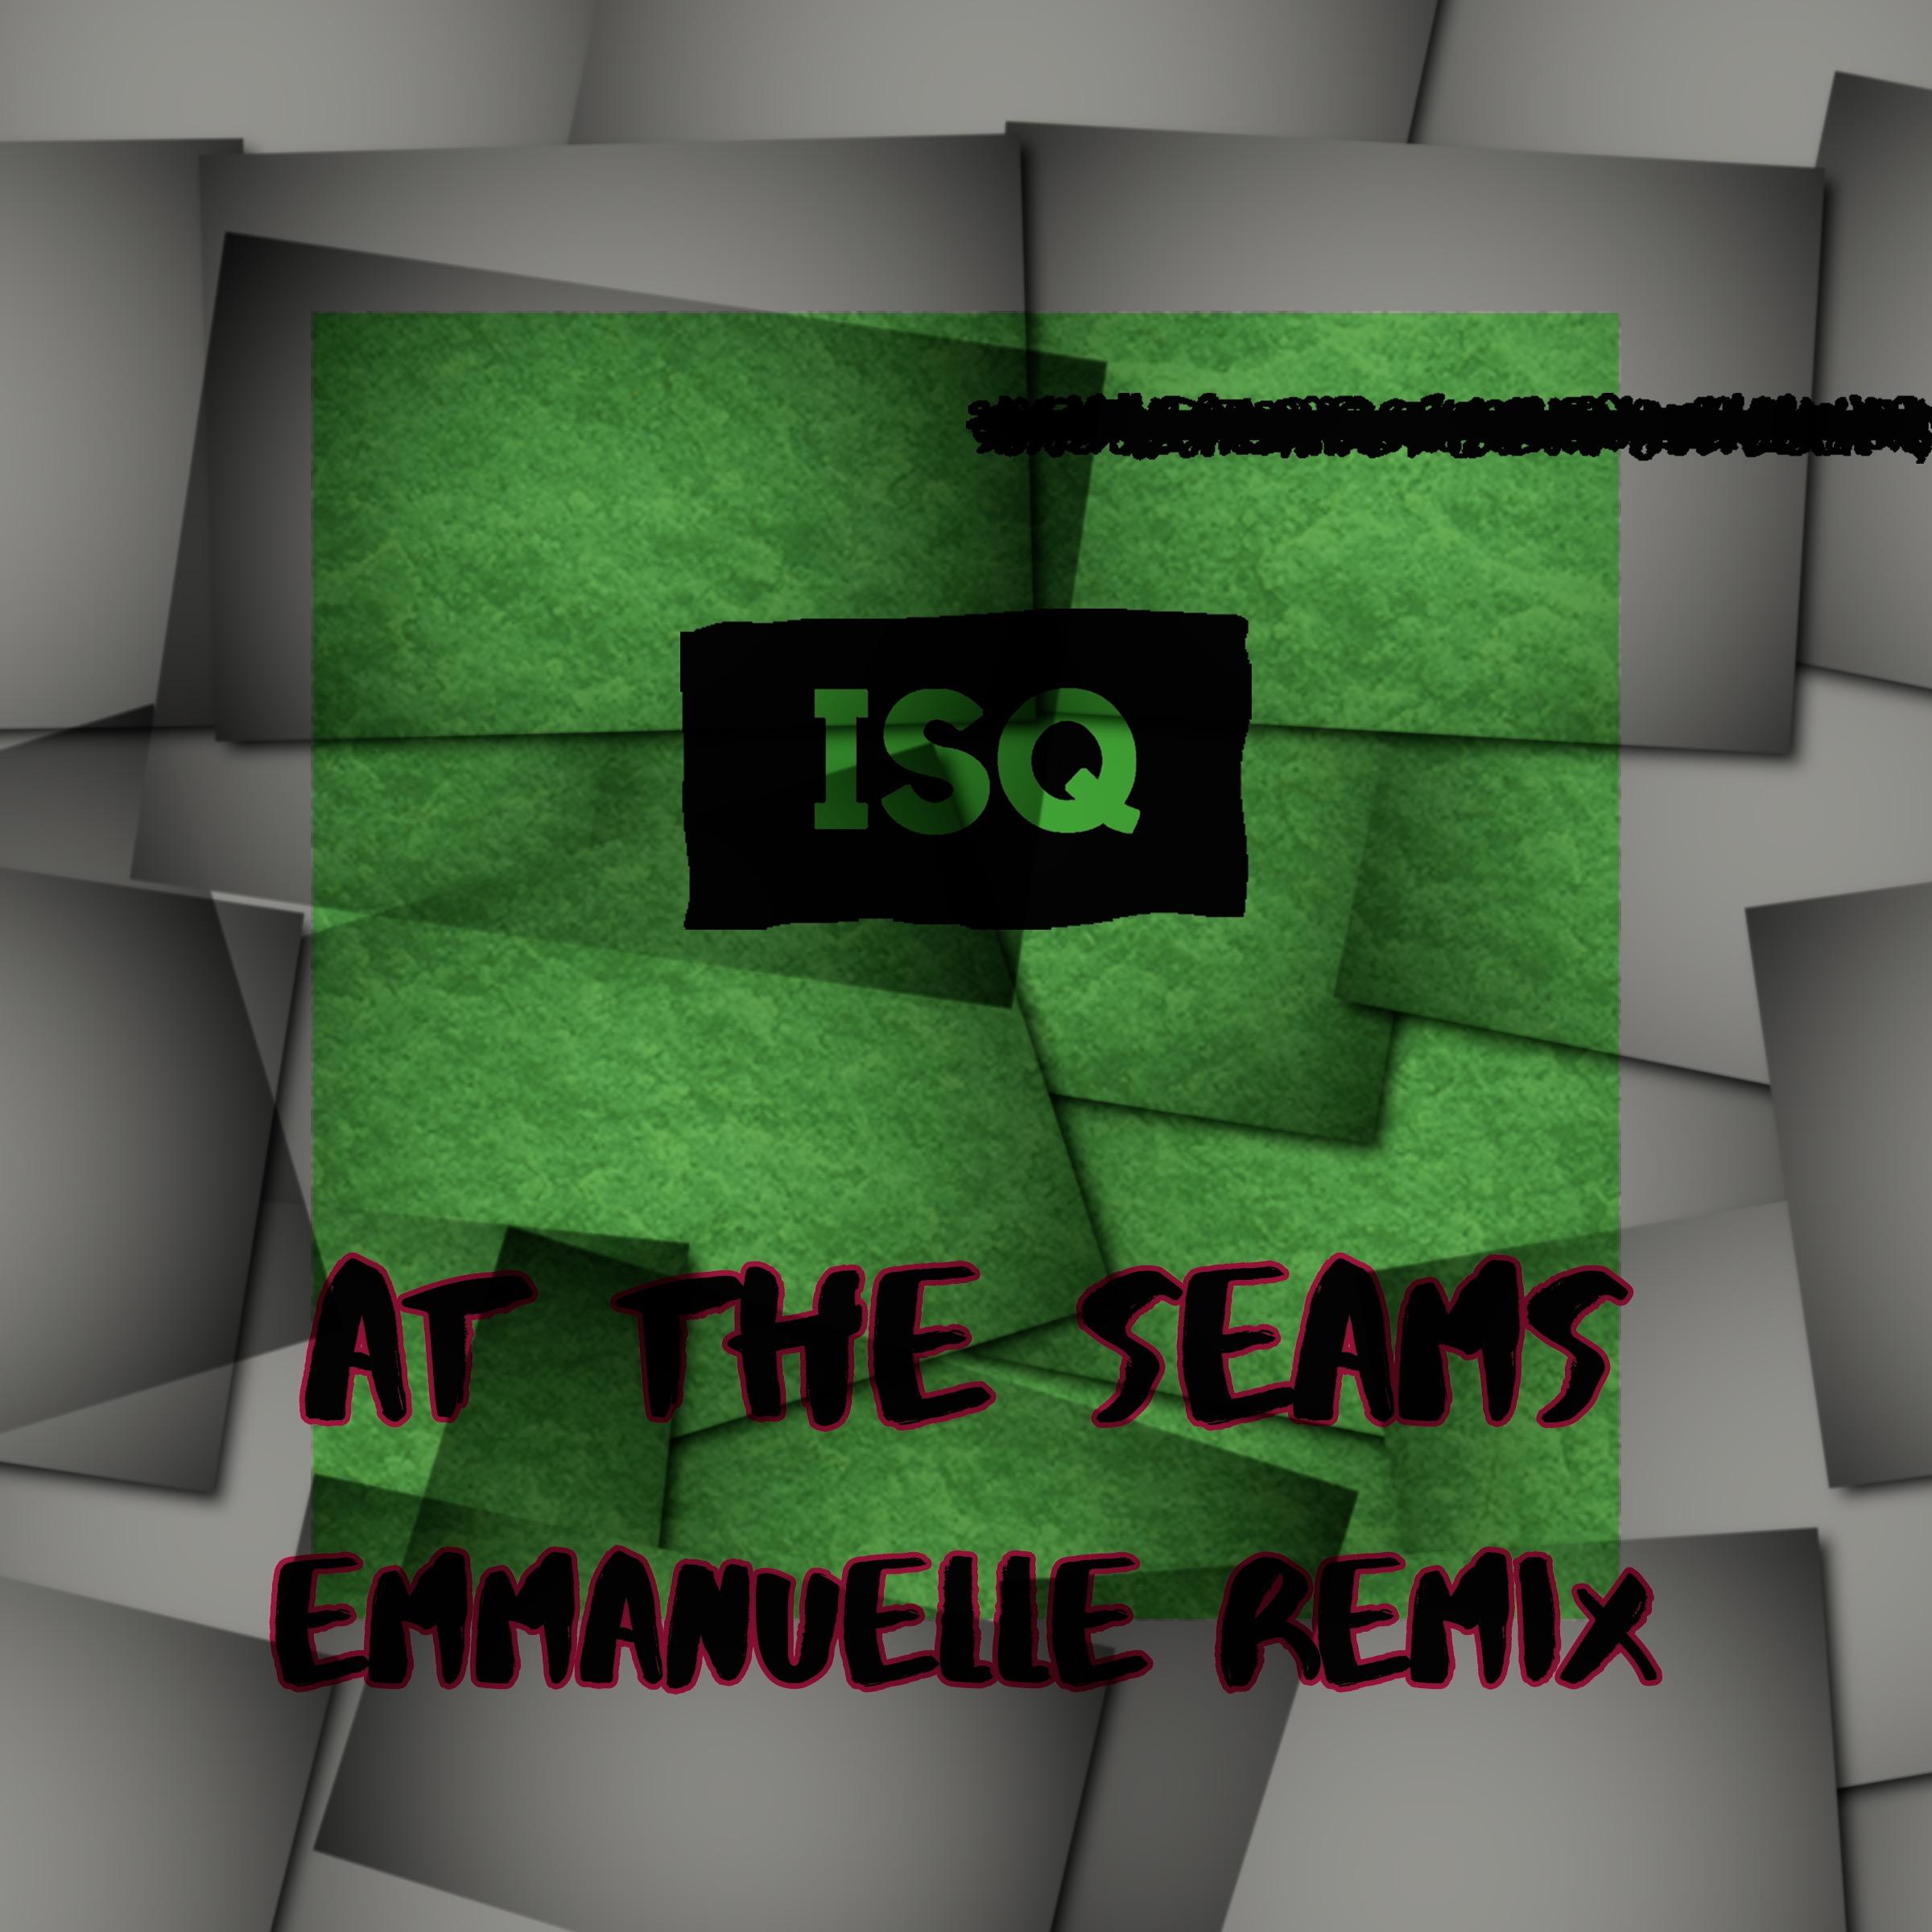 At The Seams (EMMANUELLE Remix) Image